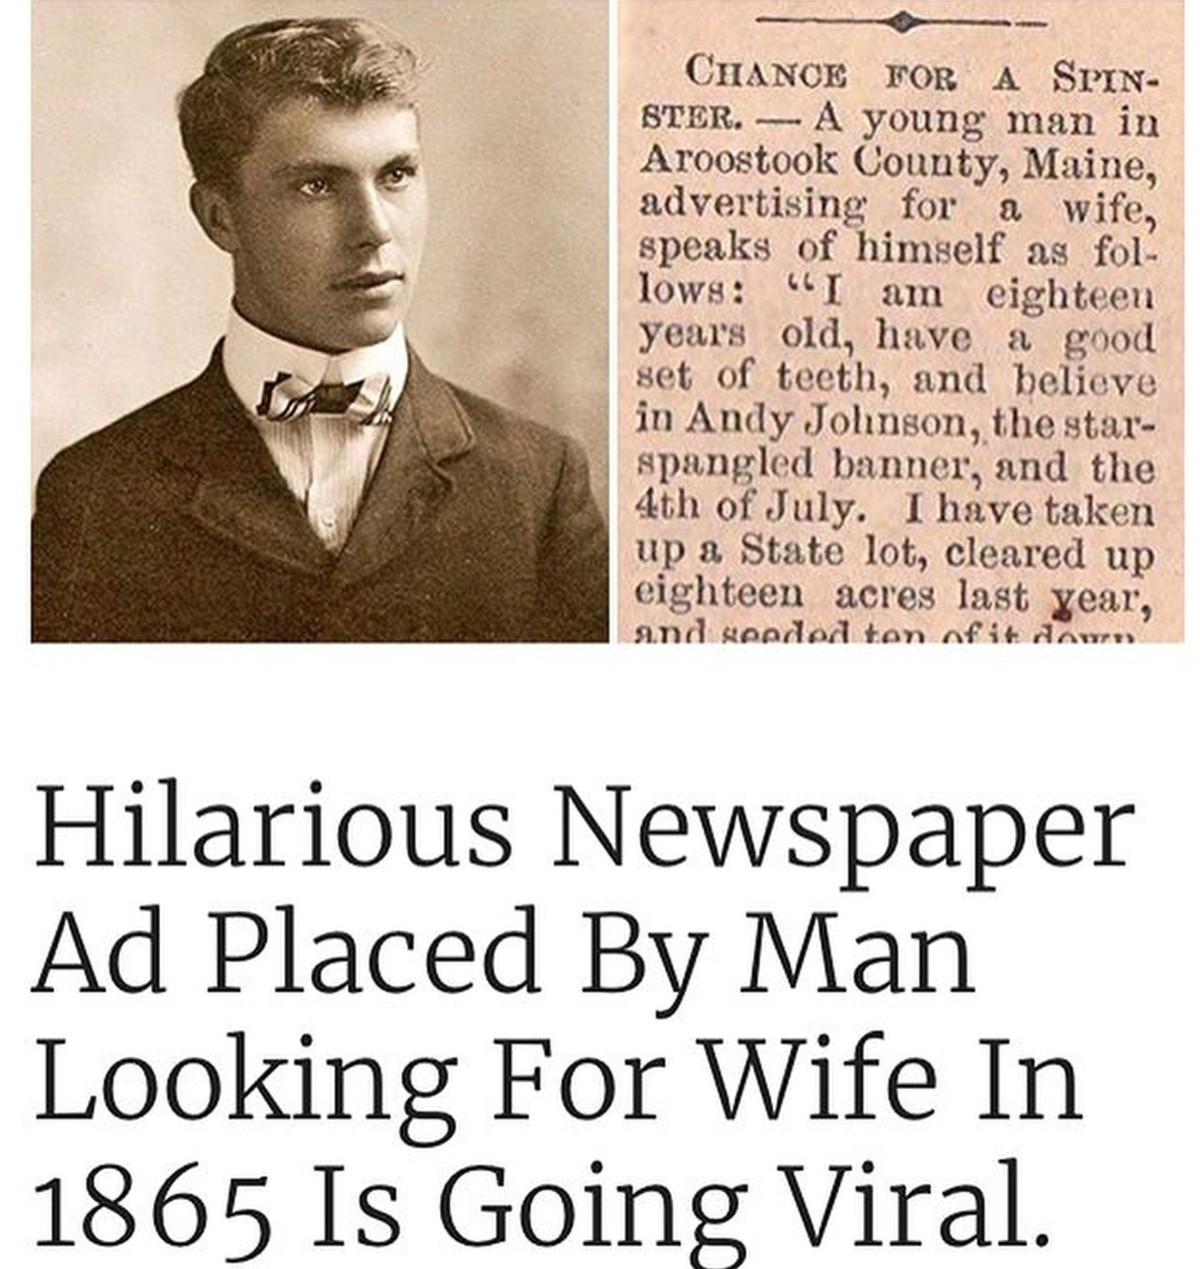 Tinder in 1865. .. /r1865k/ Tinder in 1865 /r1865k/